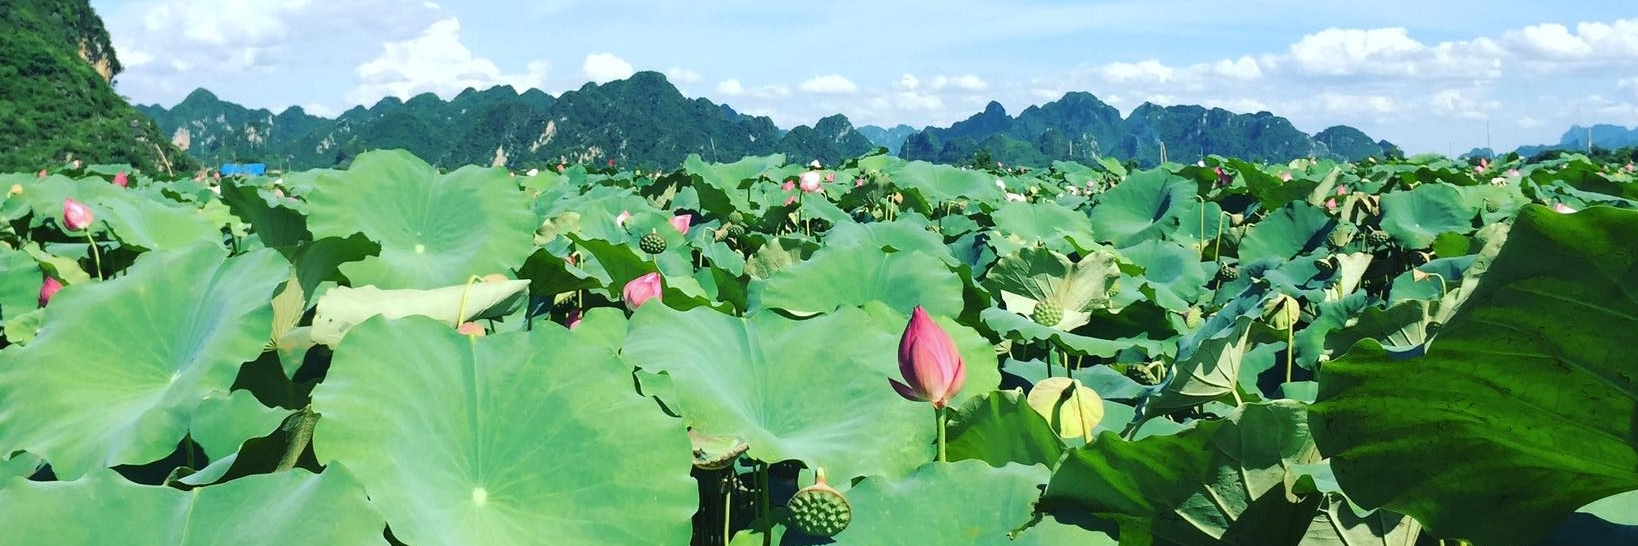 http://gody.vn/blog/toan.nguyen7562/post/dam-sen-an-phu-o-ha-noi-dep-me-man-khi-vao-mua-308